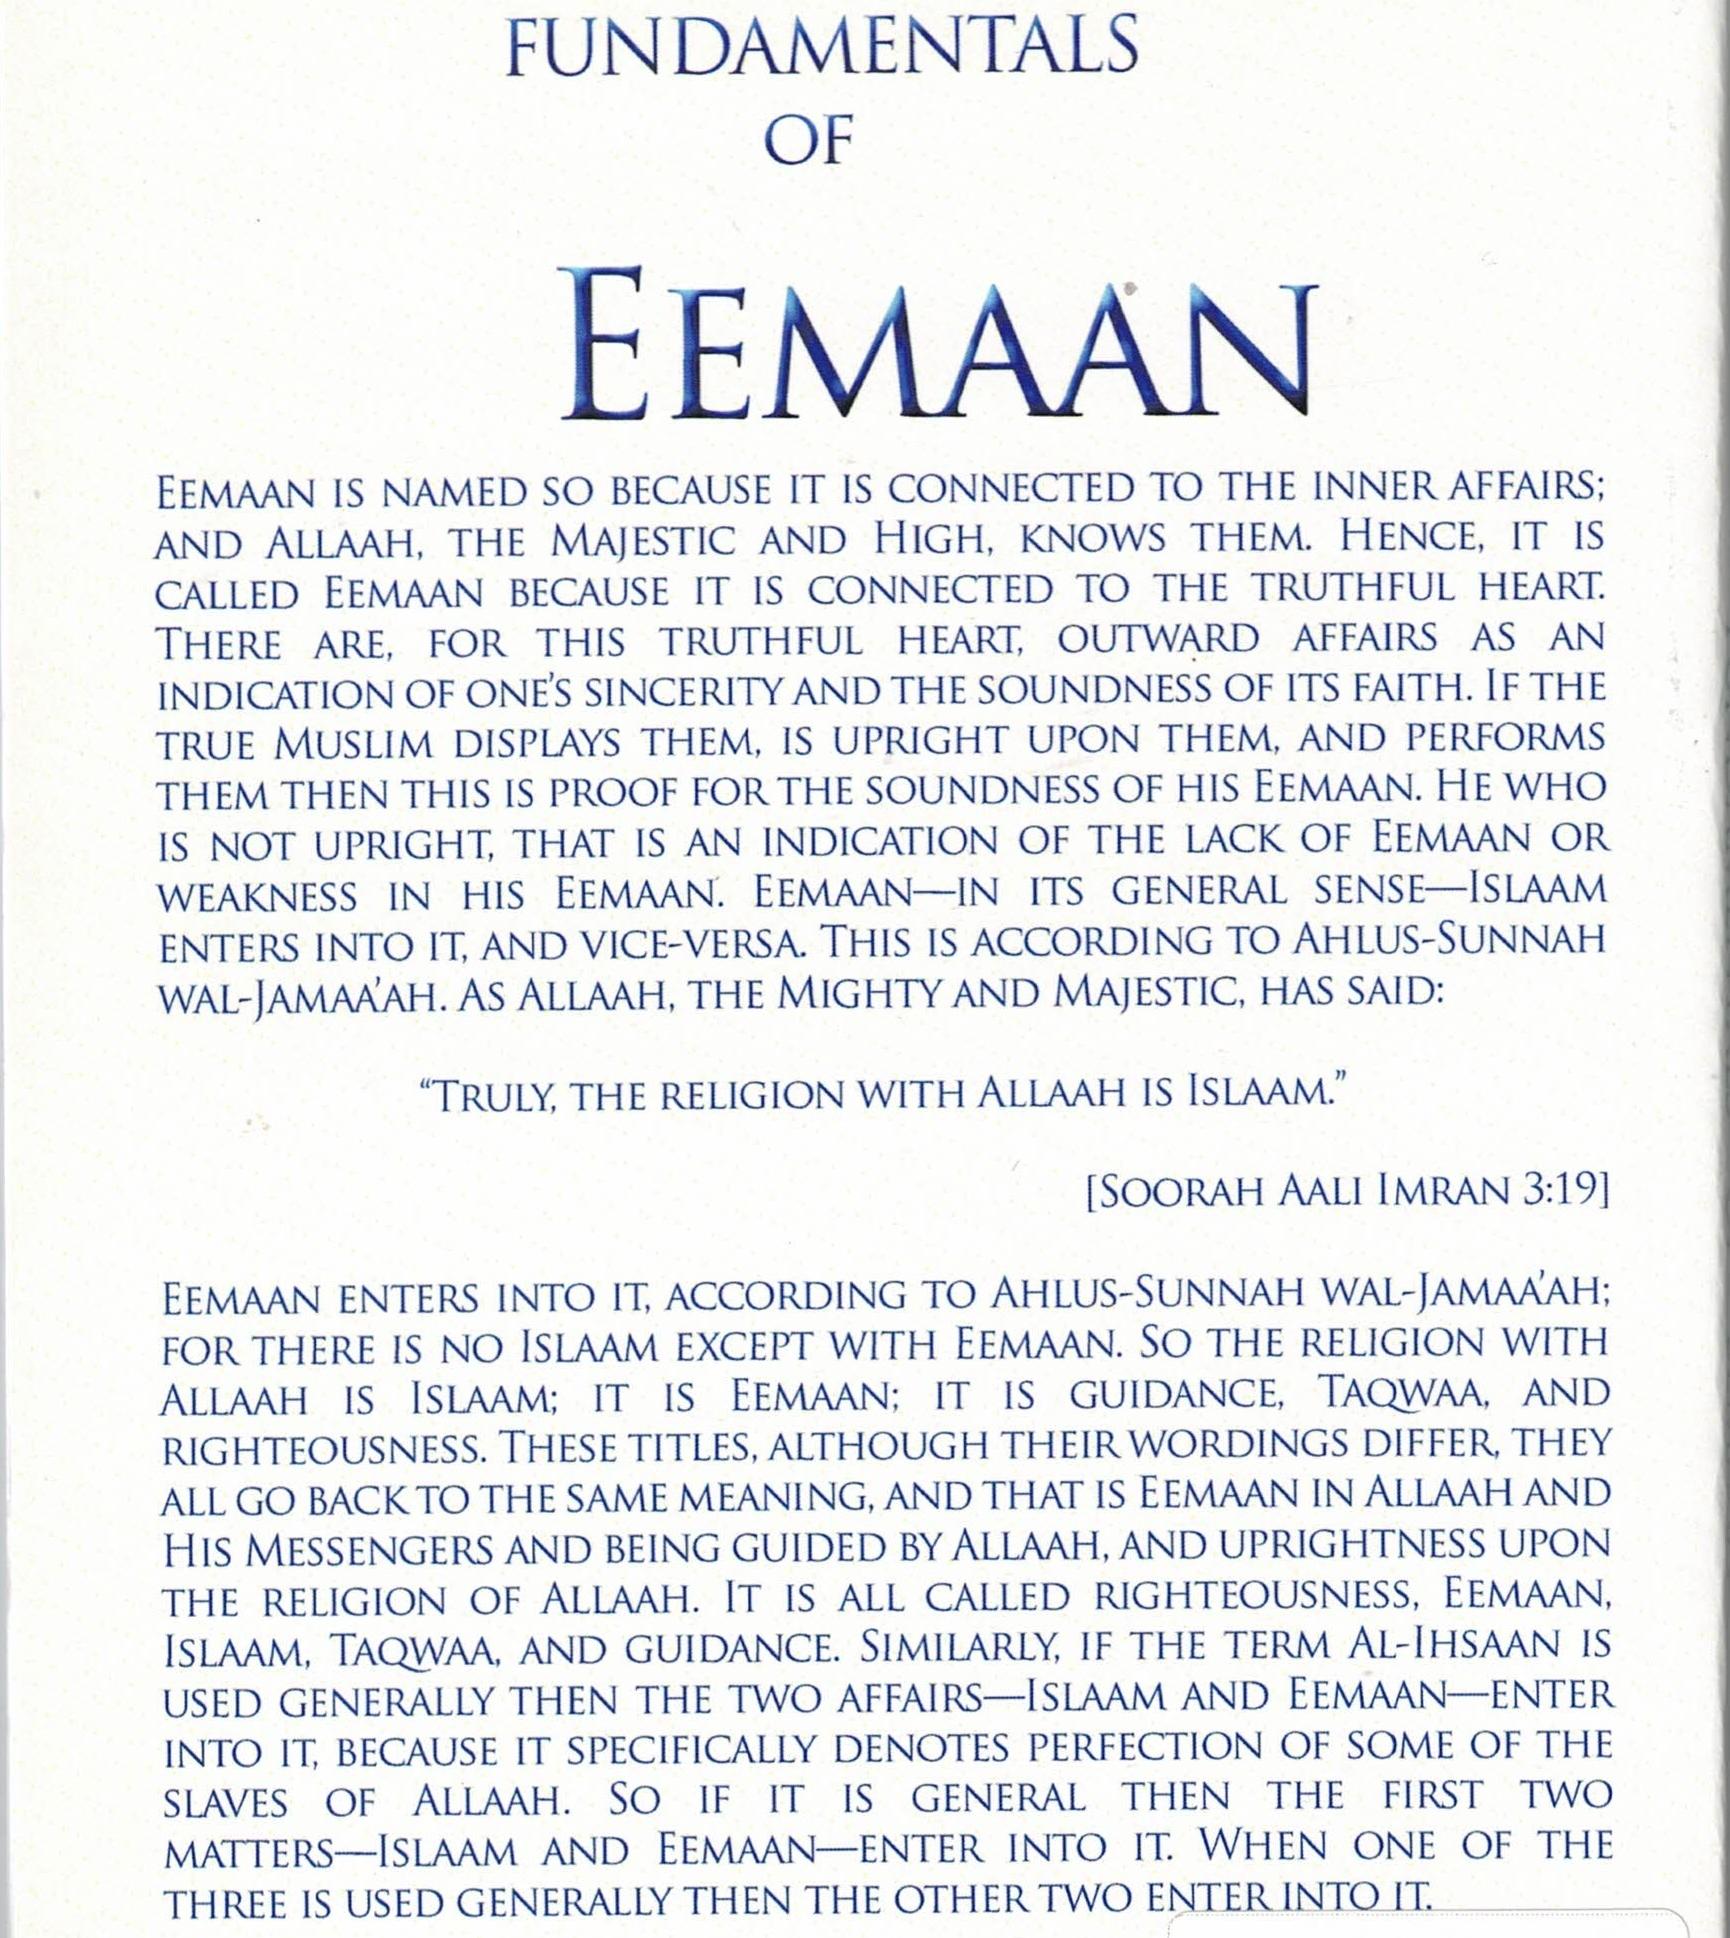 fundamentals-of-eemaan-2-copy.jpg